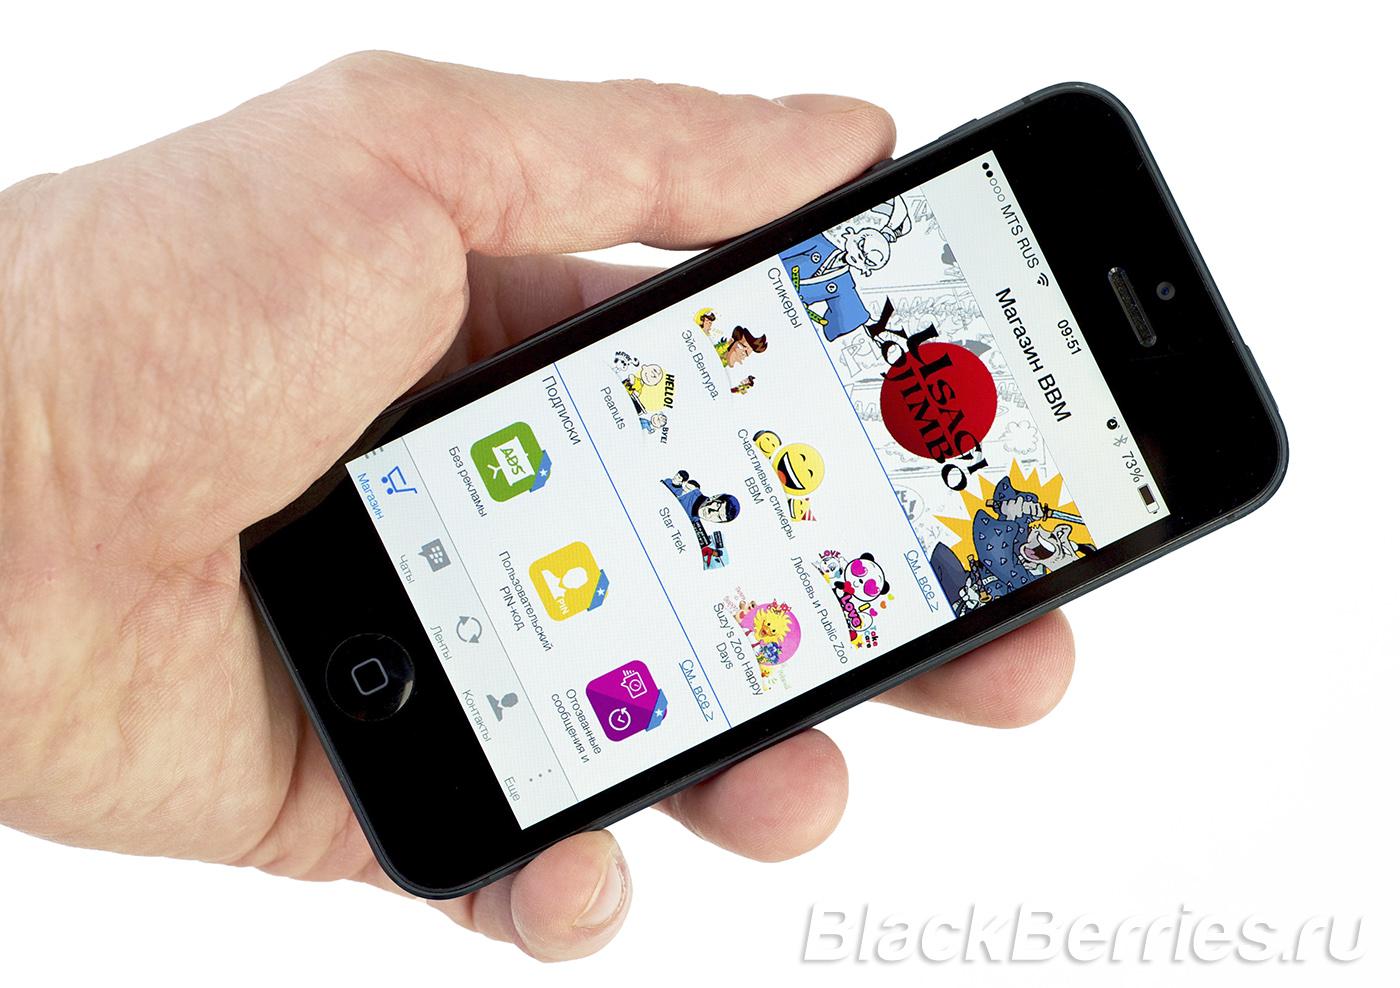 iPhone-BBM